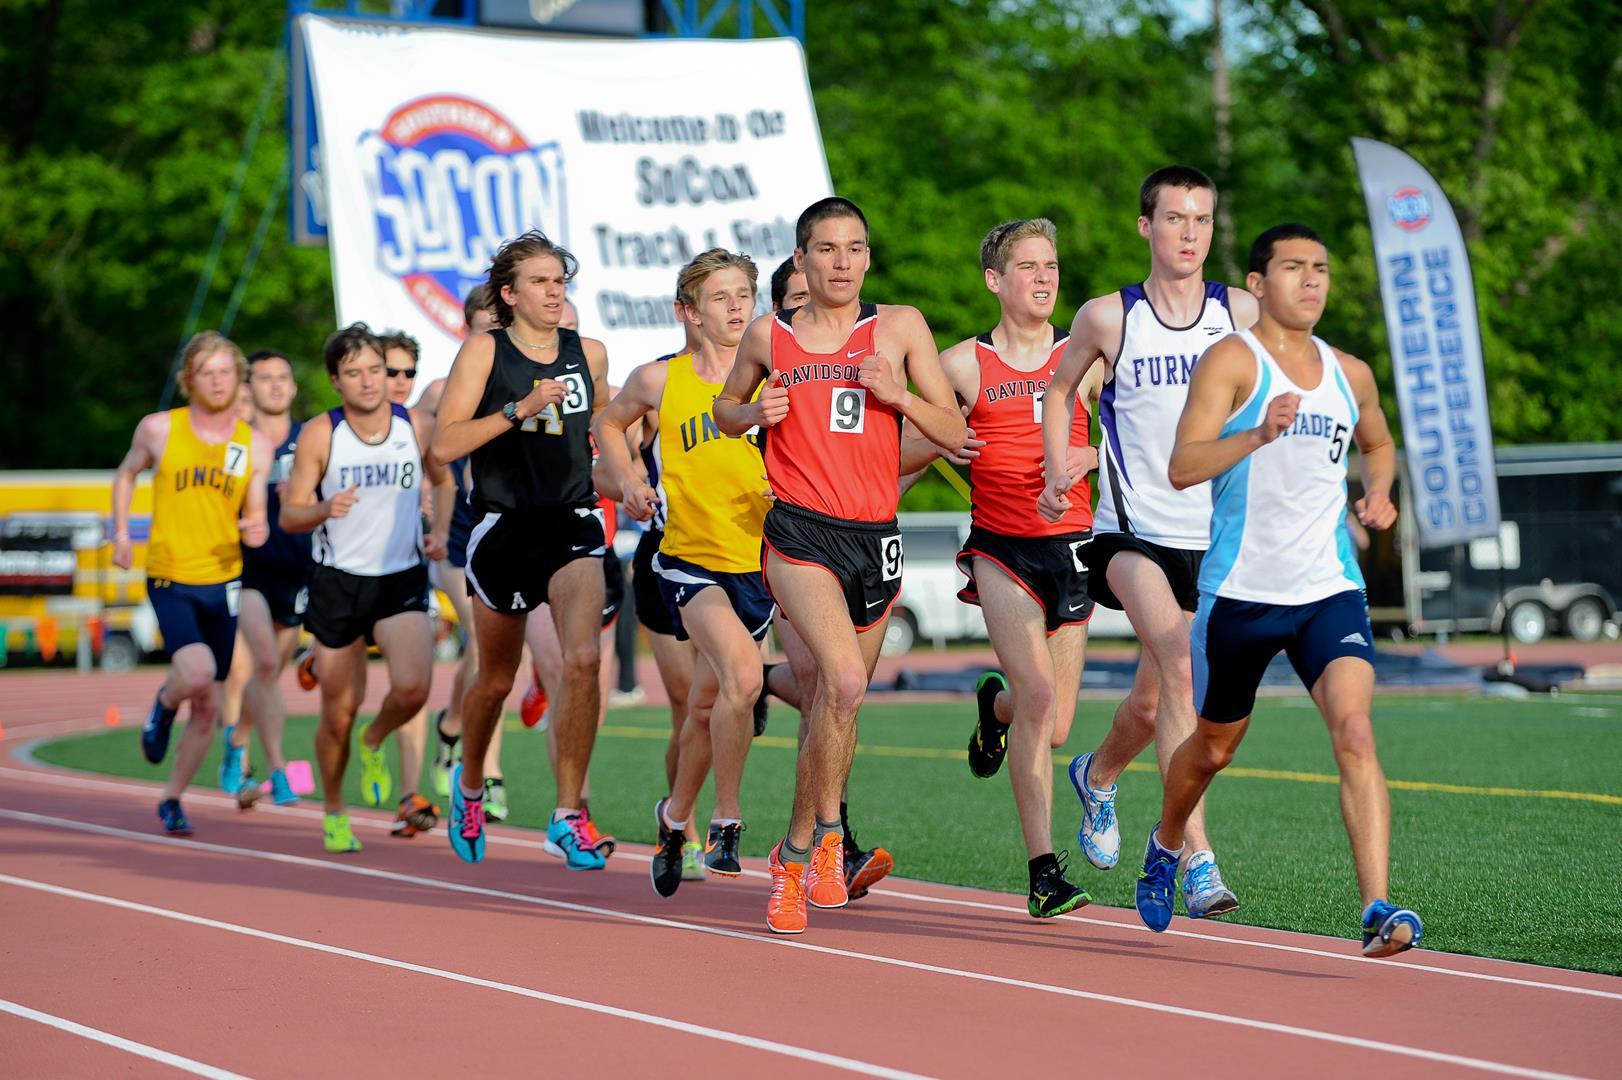 Spartanburg Turns Tournament Planners' Heads